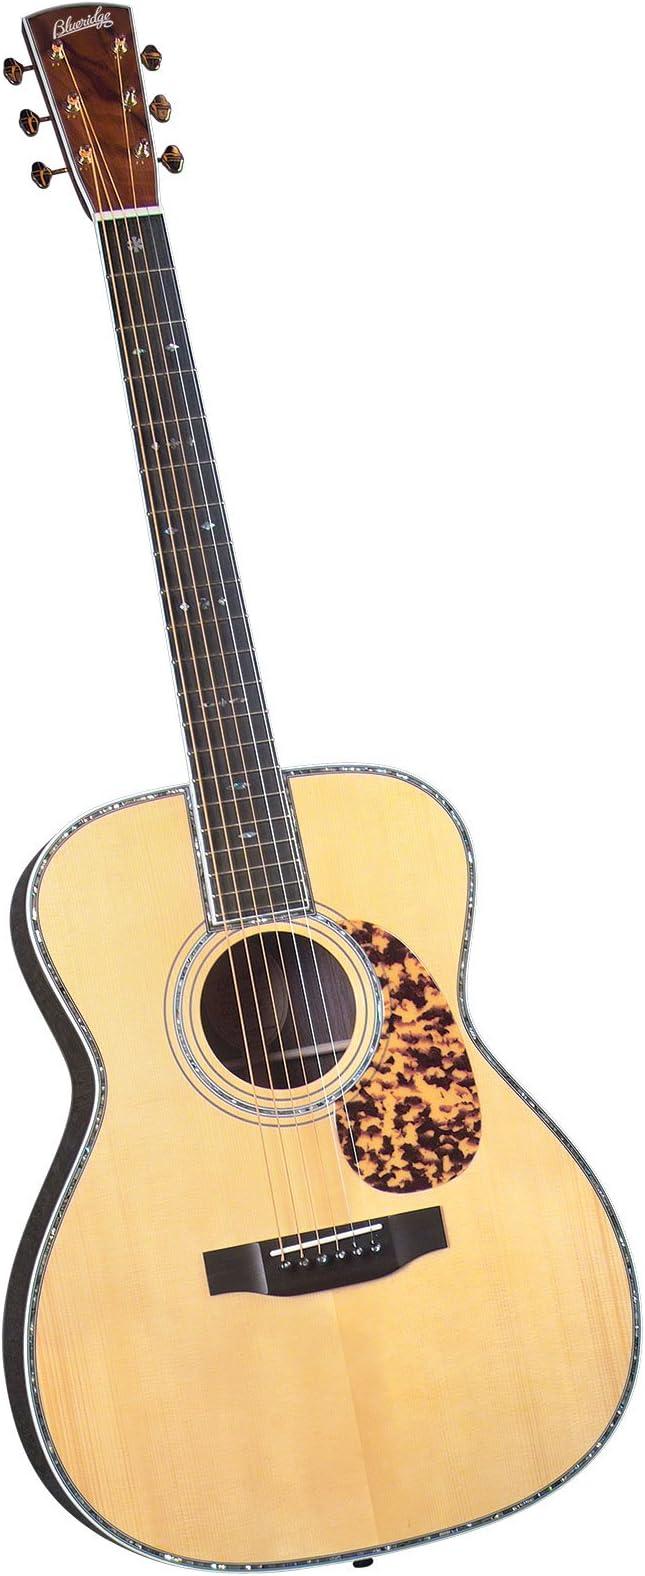 Blueridge BR-183A Historic Craftsman Series 000 Guitar